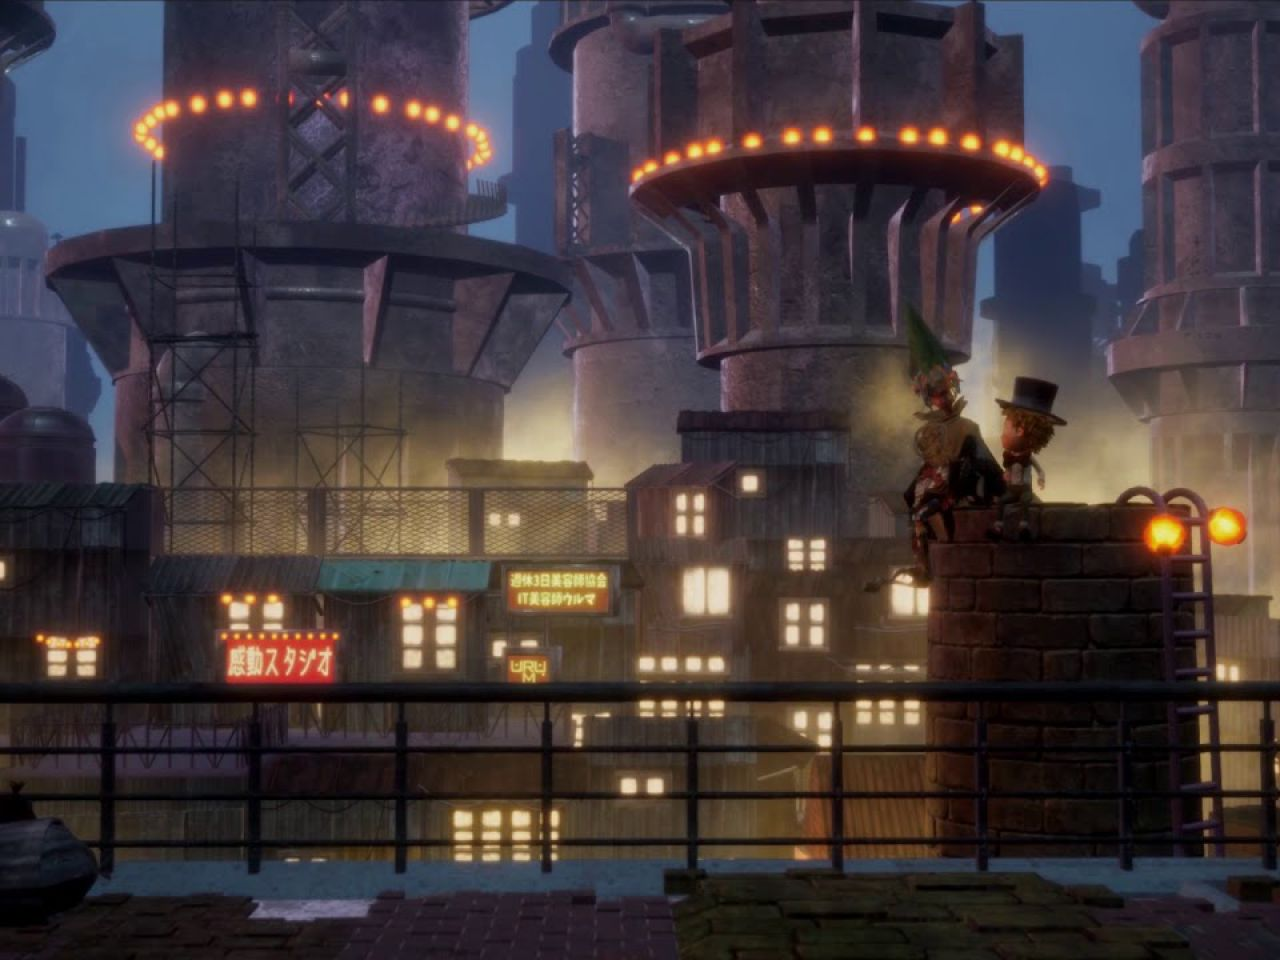 https://images.everyeye.it/img-notizie/poupelle-of-chimney-town-diventera-film-anime-staff-c-e-direttore-cgi-berserk-v3-418674-1280x960.jpg